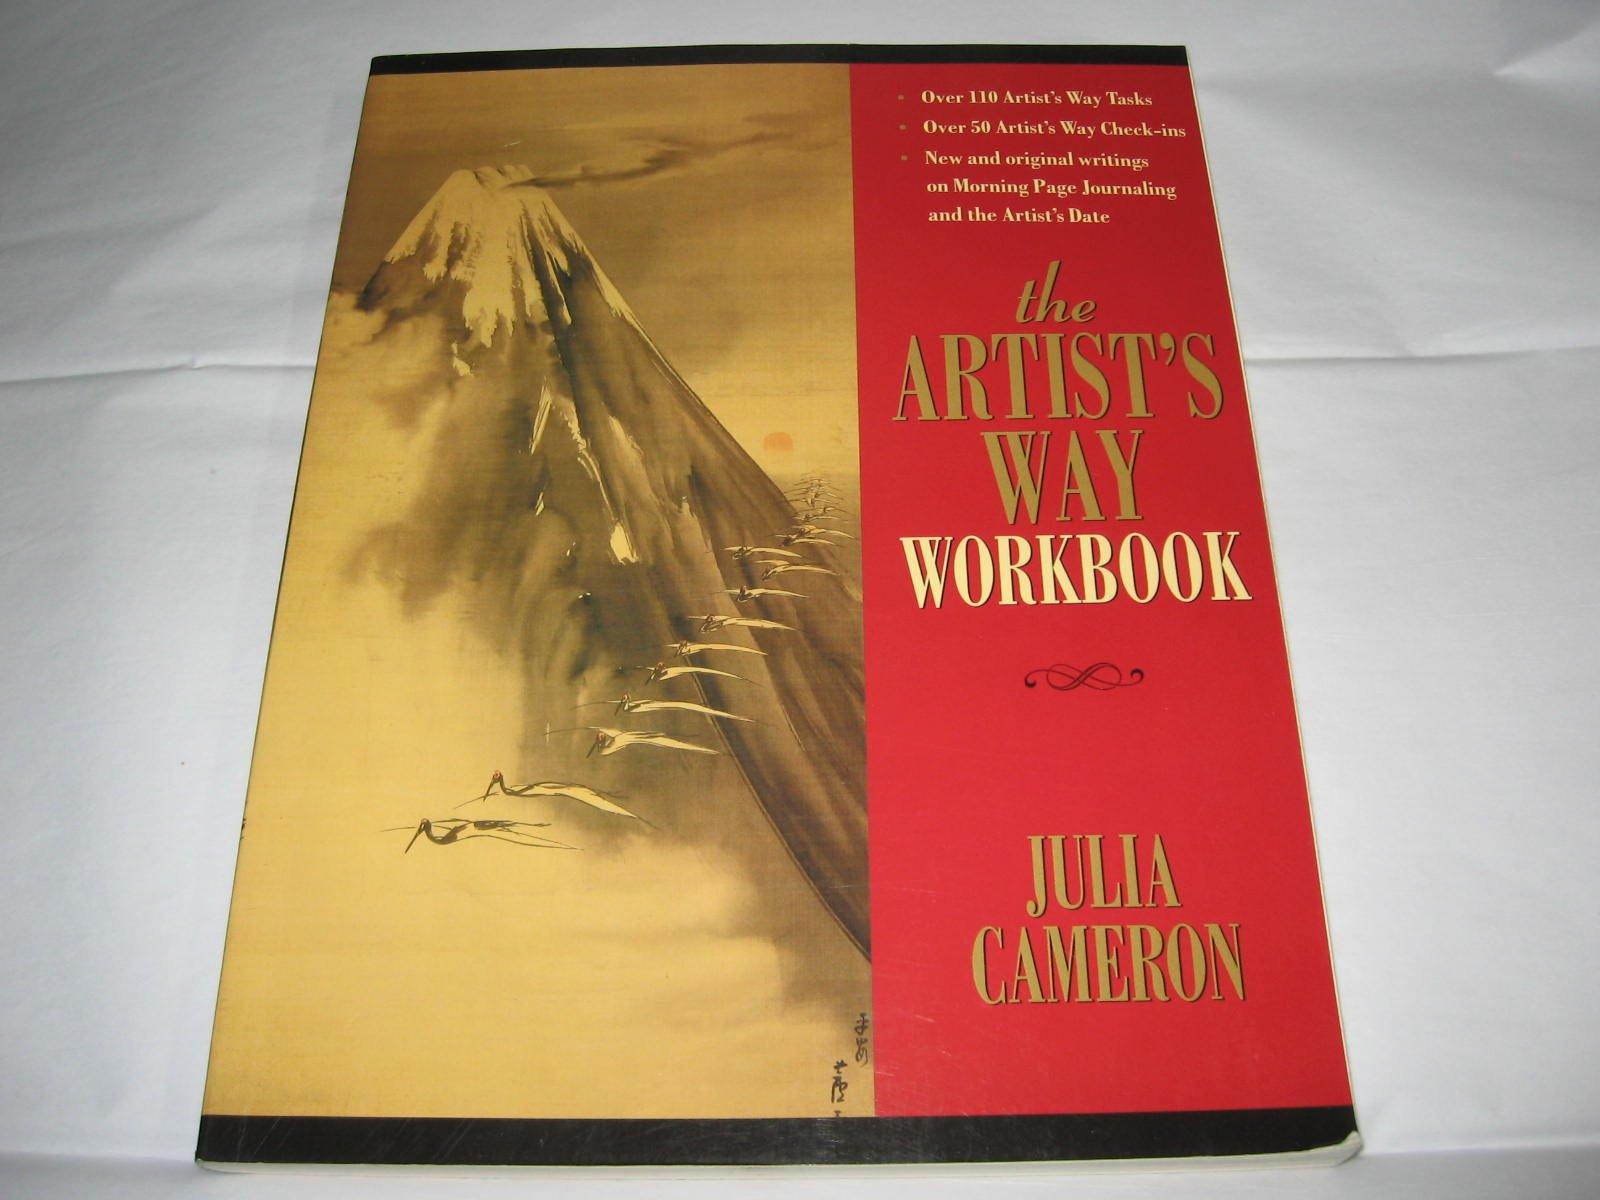 The Artist's Way Workbook: julia-cameron: 9781585425334: Amazon.com: Books